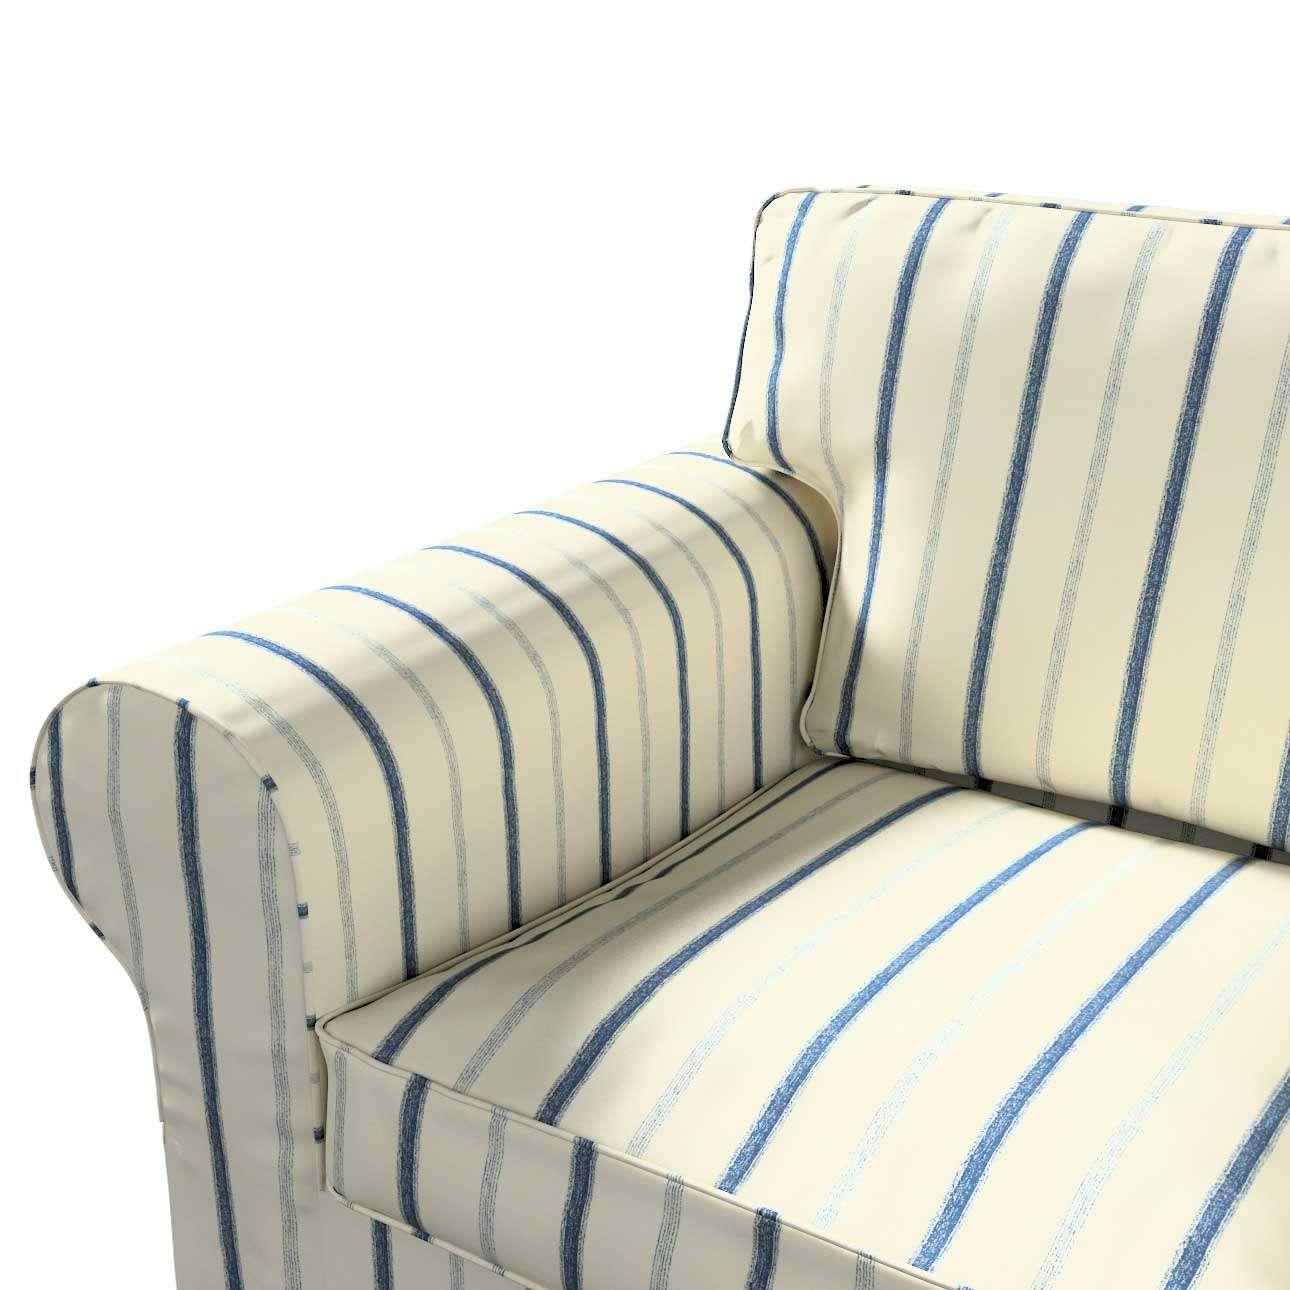 Ektorp 2 sæder sovesofa fra 2012<br/>Bredde ca 200cm Betræk uden sofa fra kollektionen Avinon, Stof: 129-66